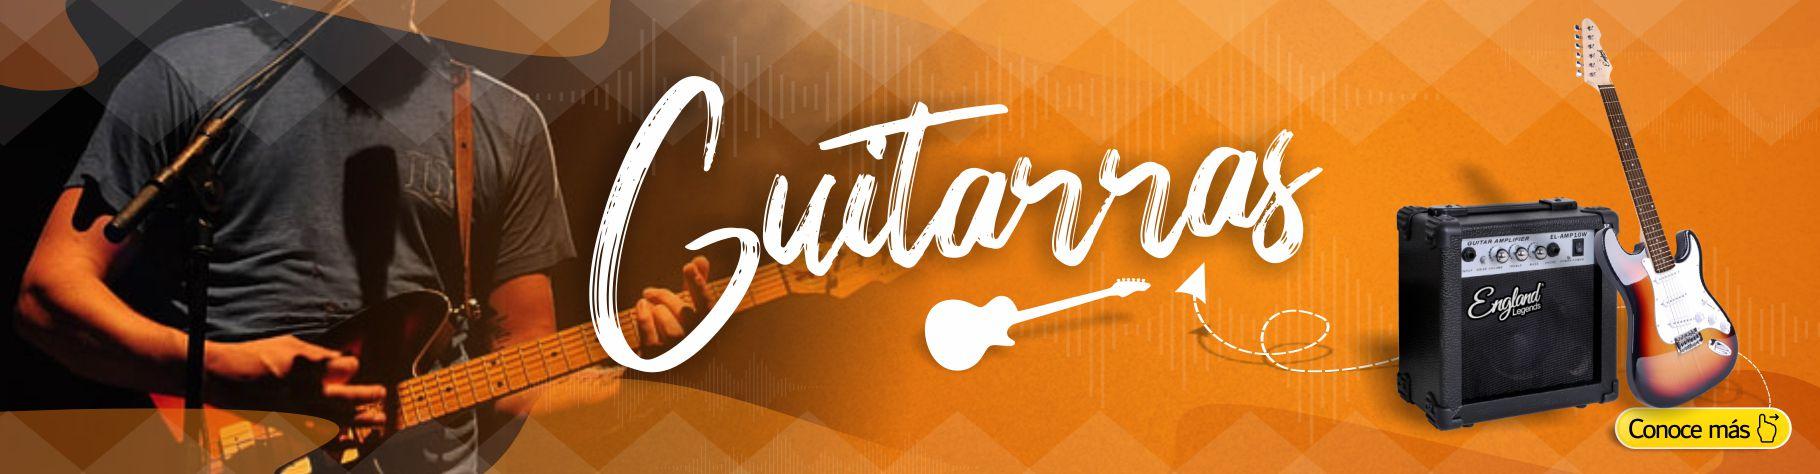 guitarras-banner